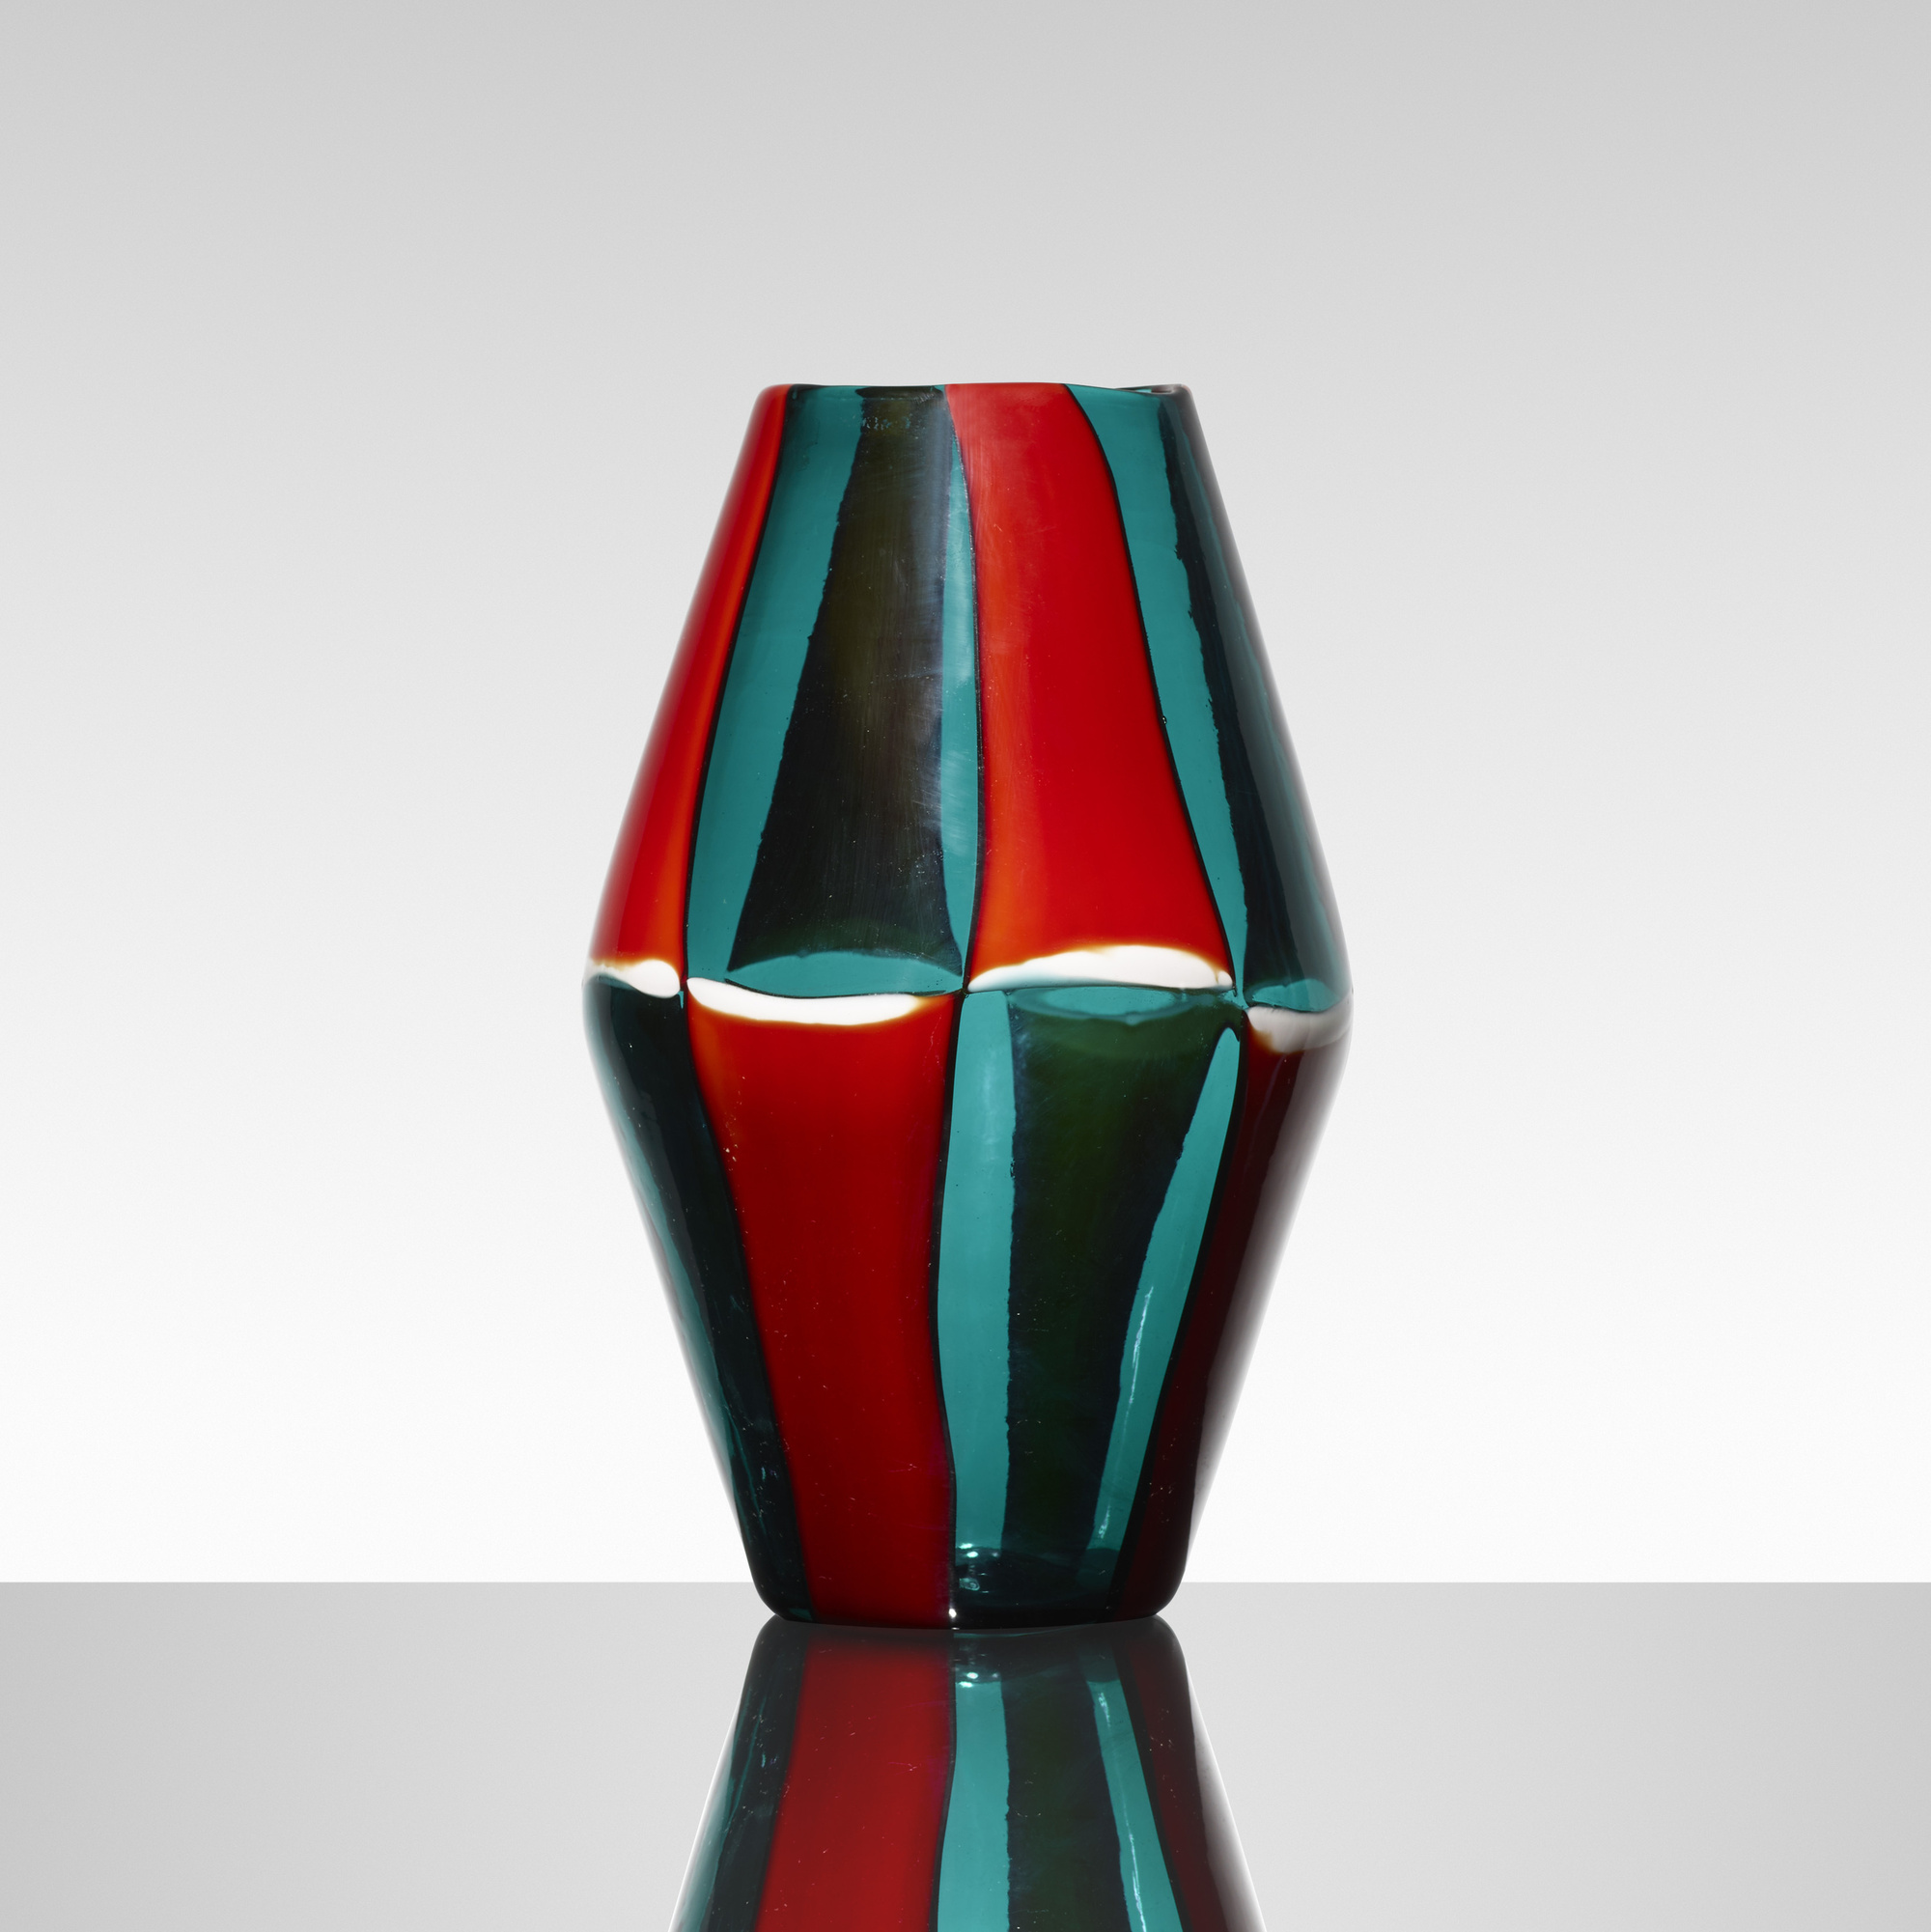 144: Fulvio Bianconi / Bi-Pezzato vase, model 4318 (1 of 5)